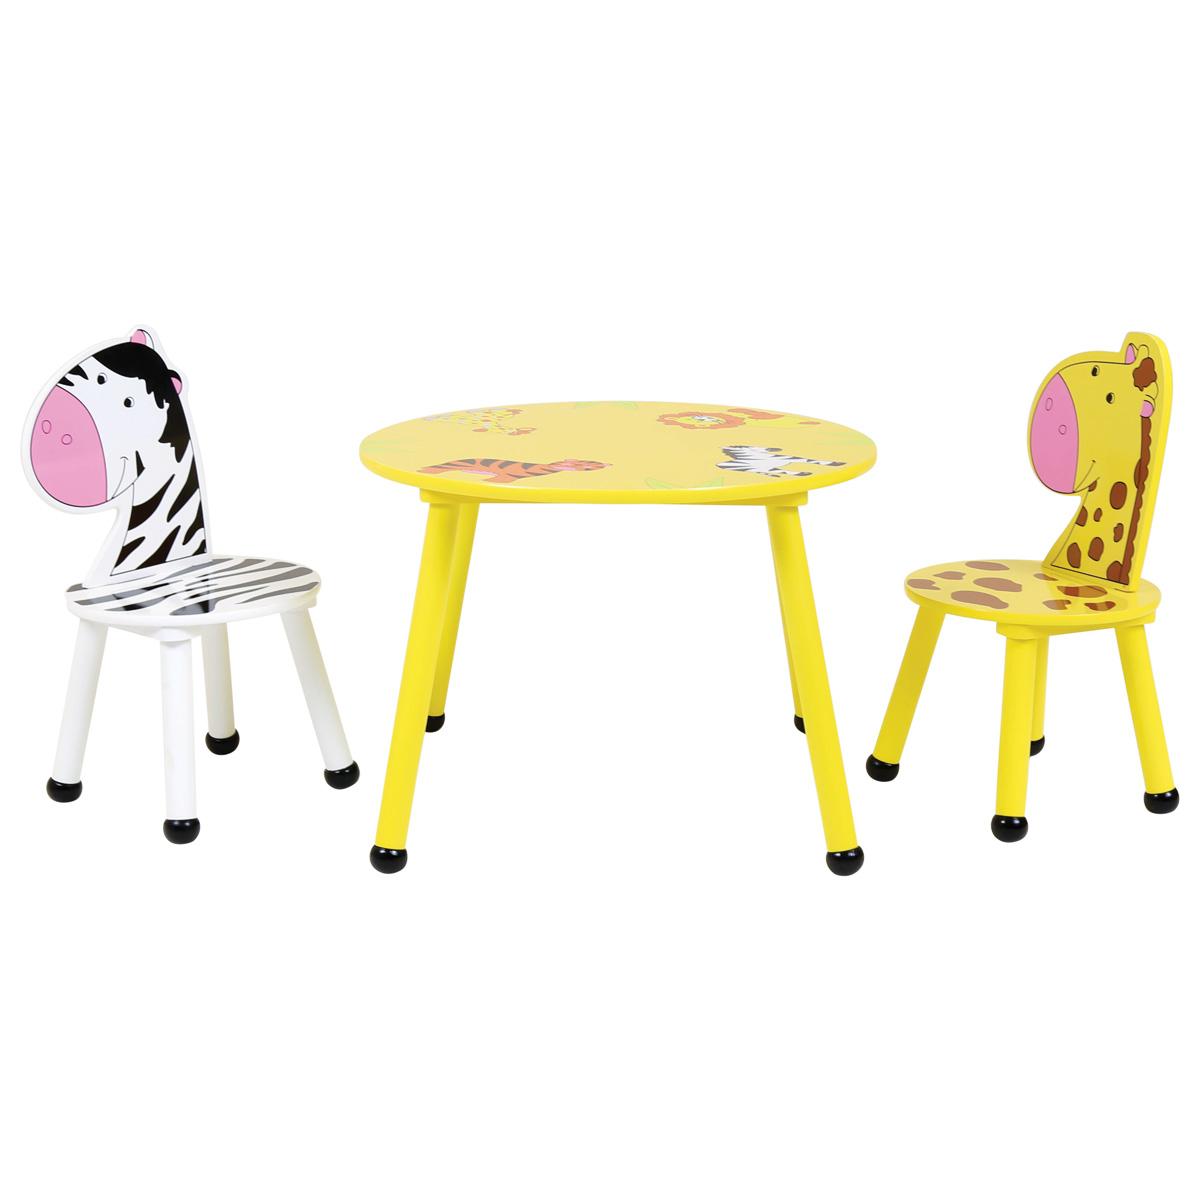 5cc72d97b8f Kids Jungle Safari Wooden Table   2 Or 4 Chairs Set Children S ...